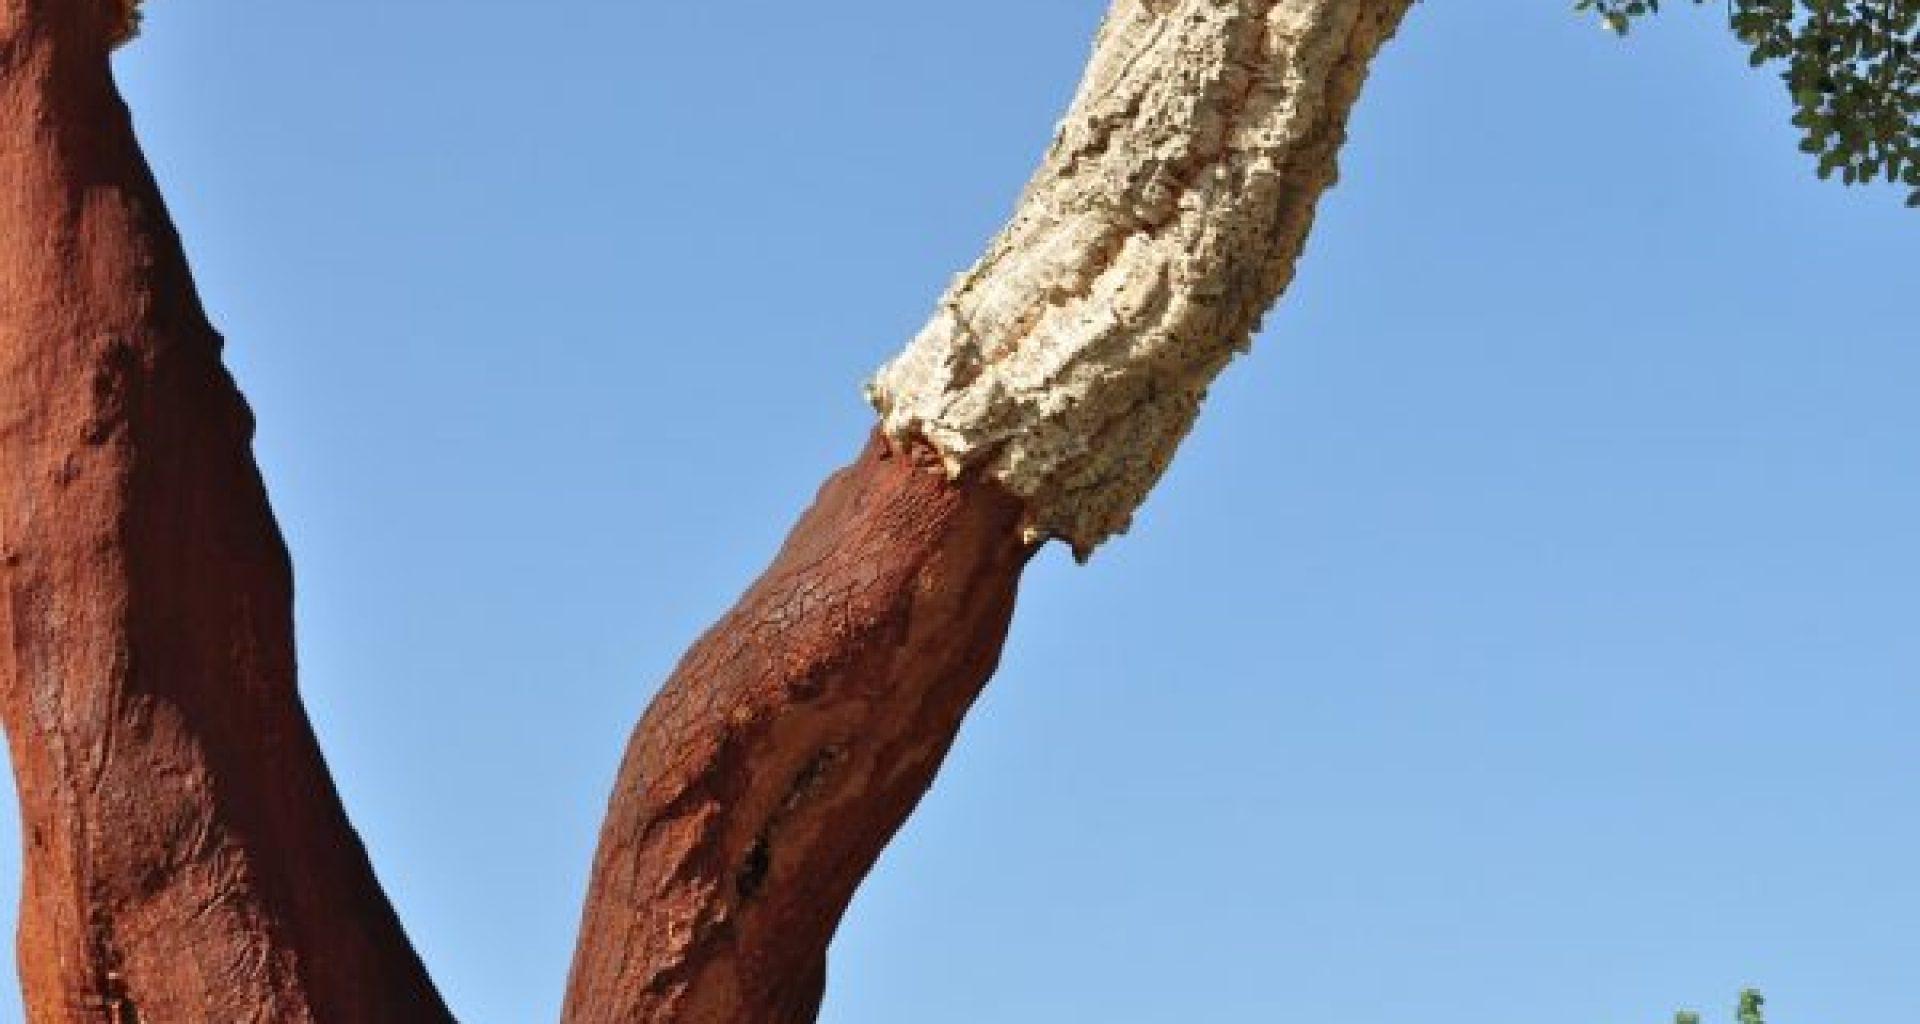 cork-oak-505260_960_720